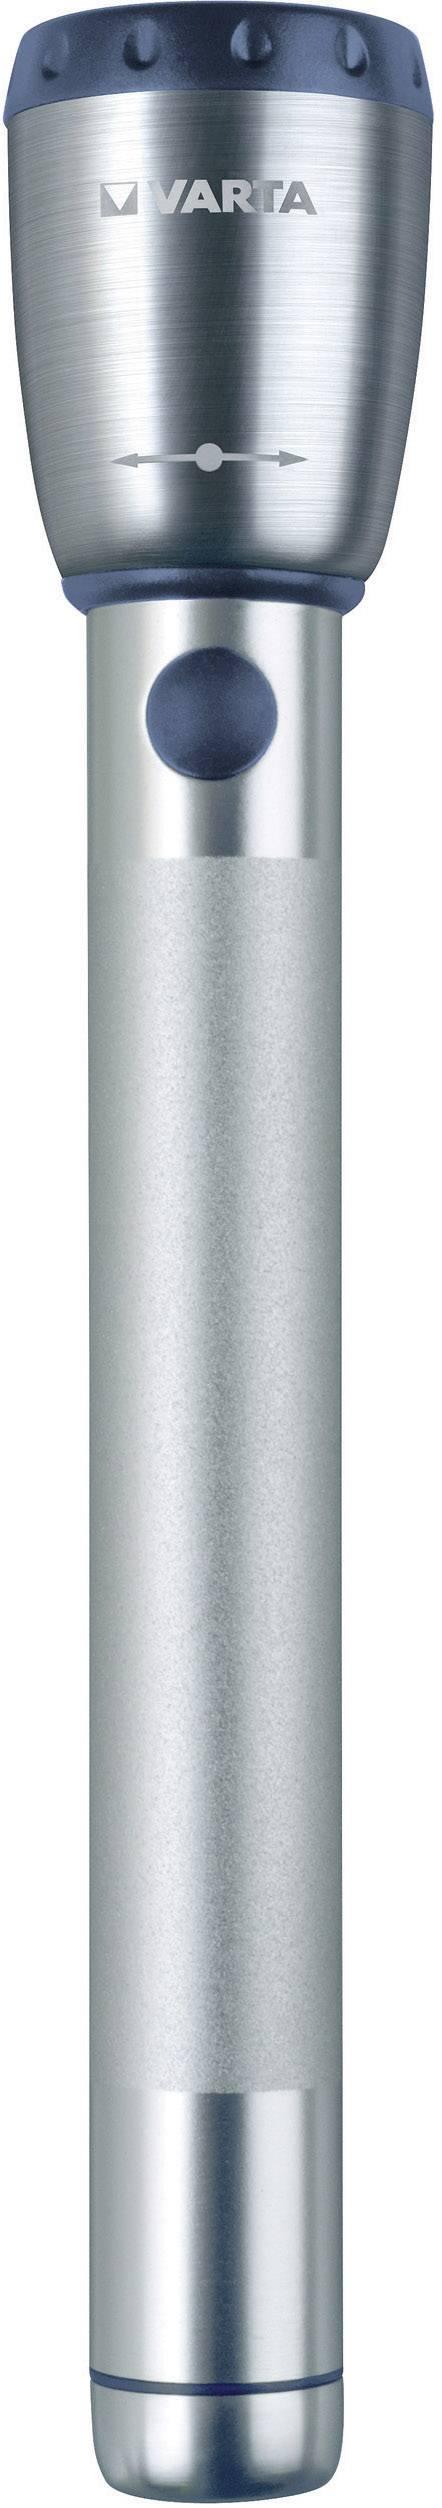 LED vreckové svietidlo (baterka) Varta Premium 2 AA 17635101421, 92 g, na batérie, strieborná